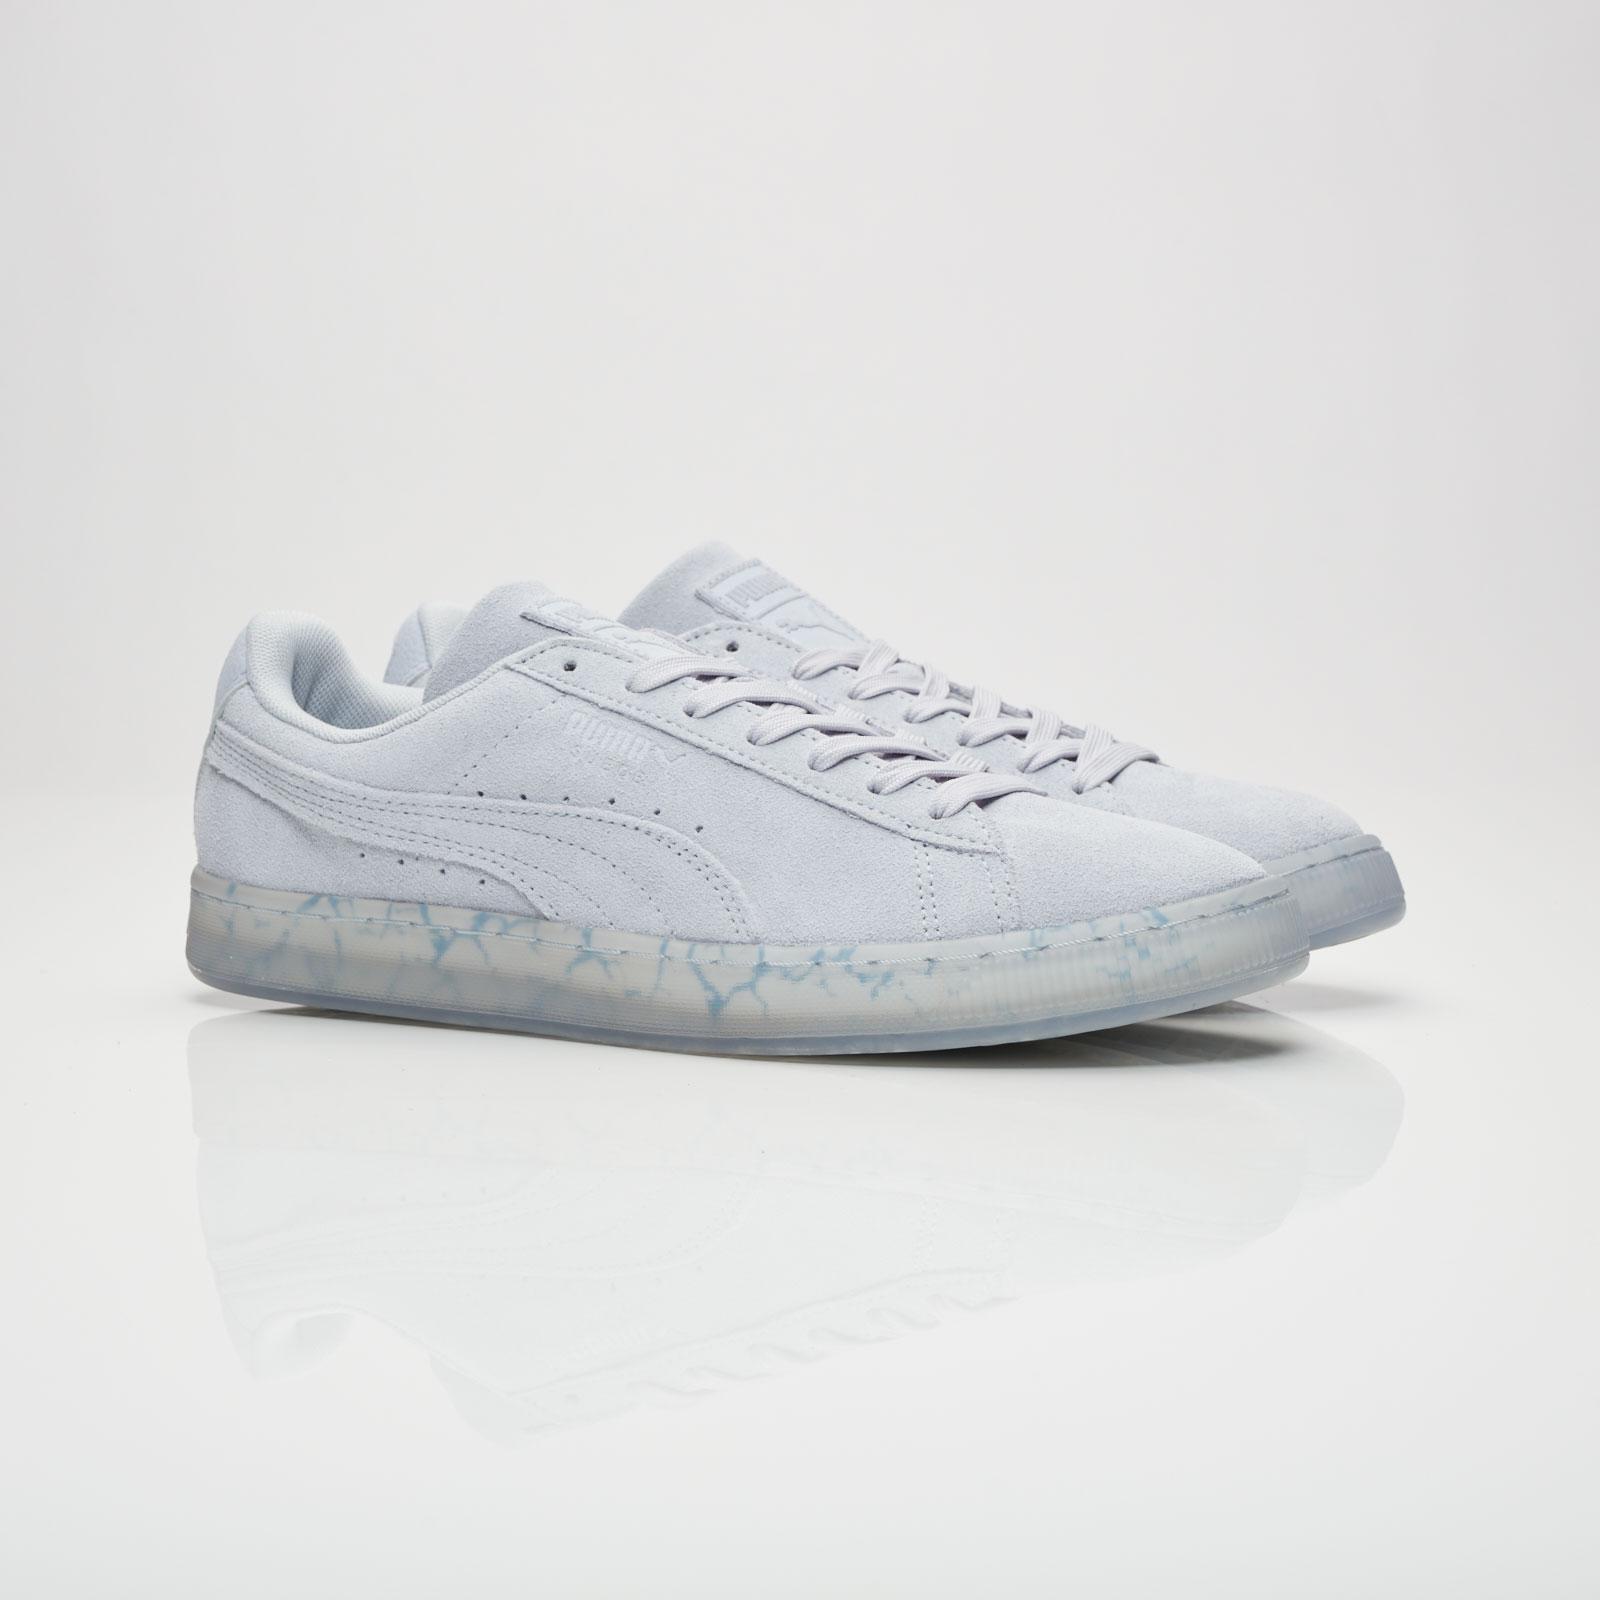 Puma SneakersnstuffSneakers Fm 03 Easter 362556 Suede Classic LRAj45